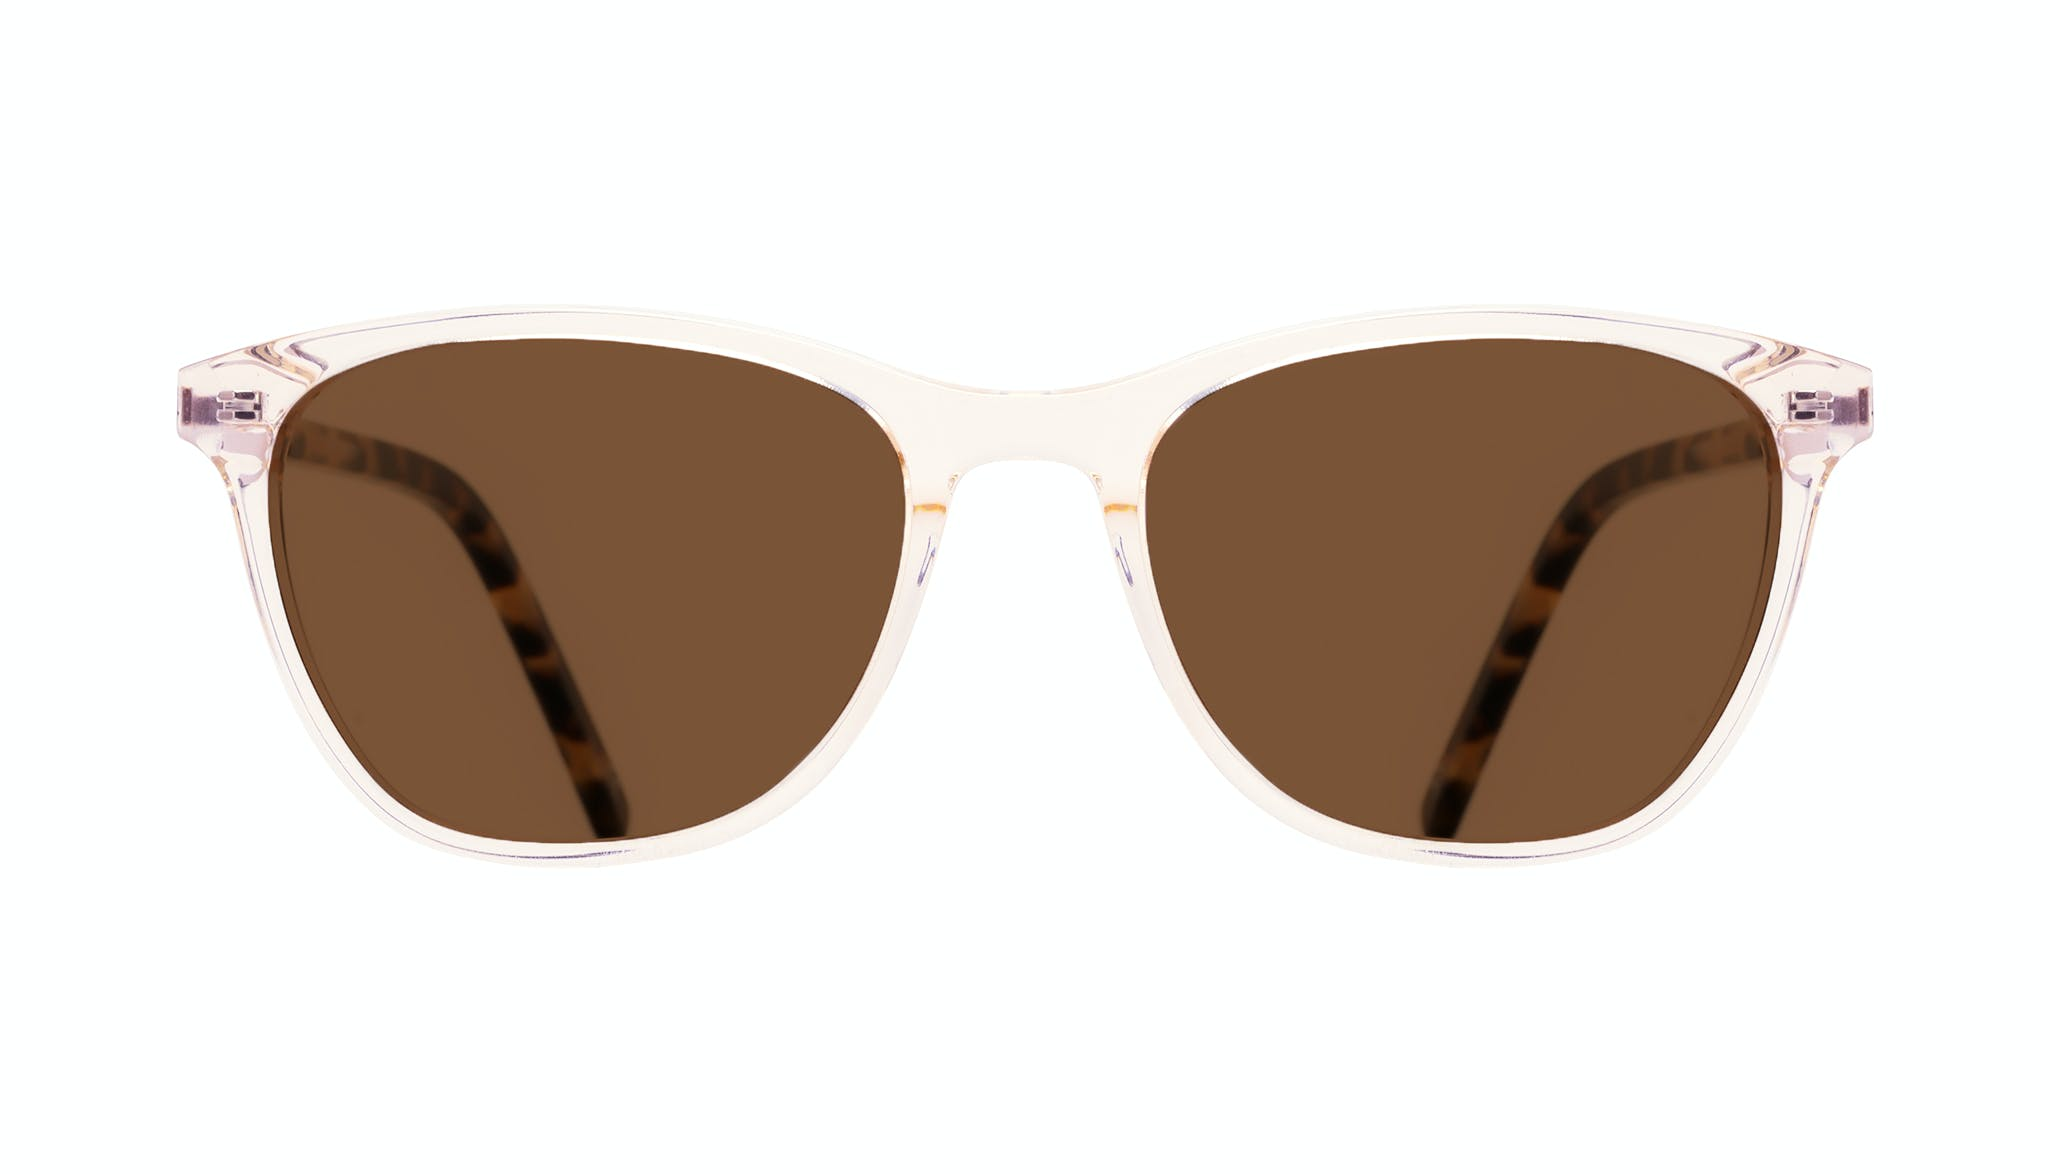 Affordable Fashion Glasses Cat Eye Rectangle Sunglasses Women Folk Blond Tortoise